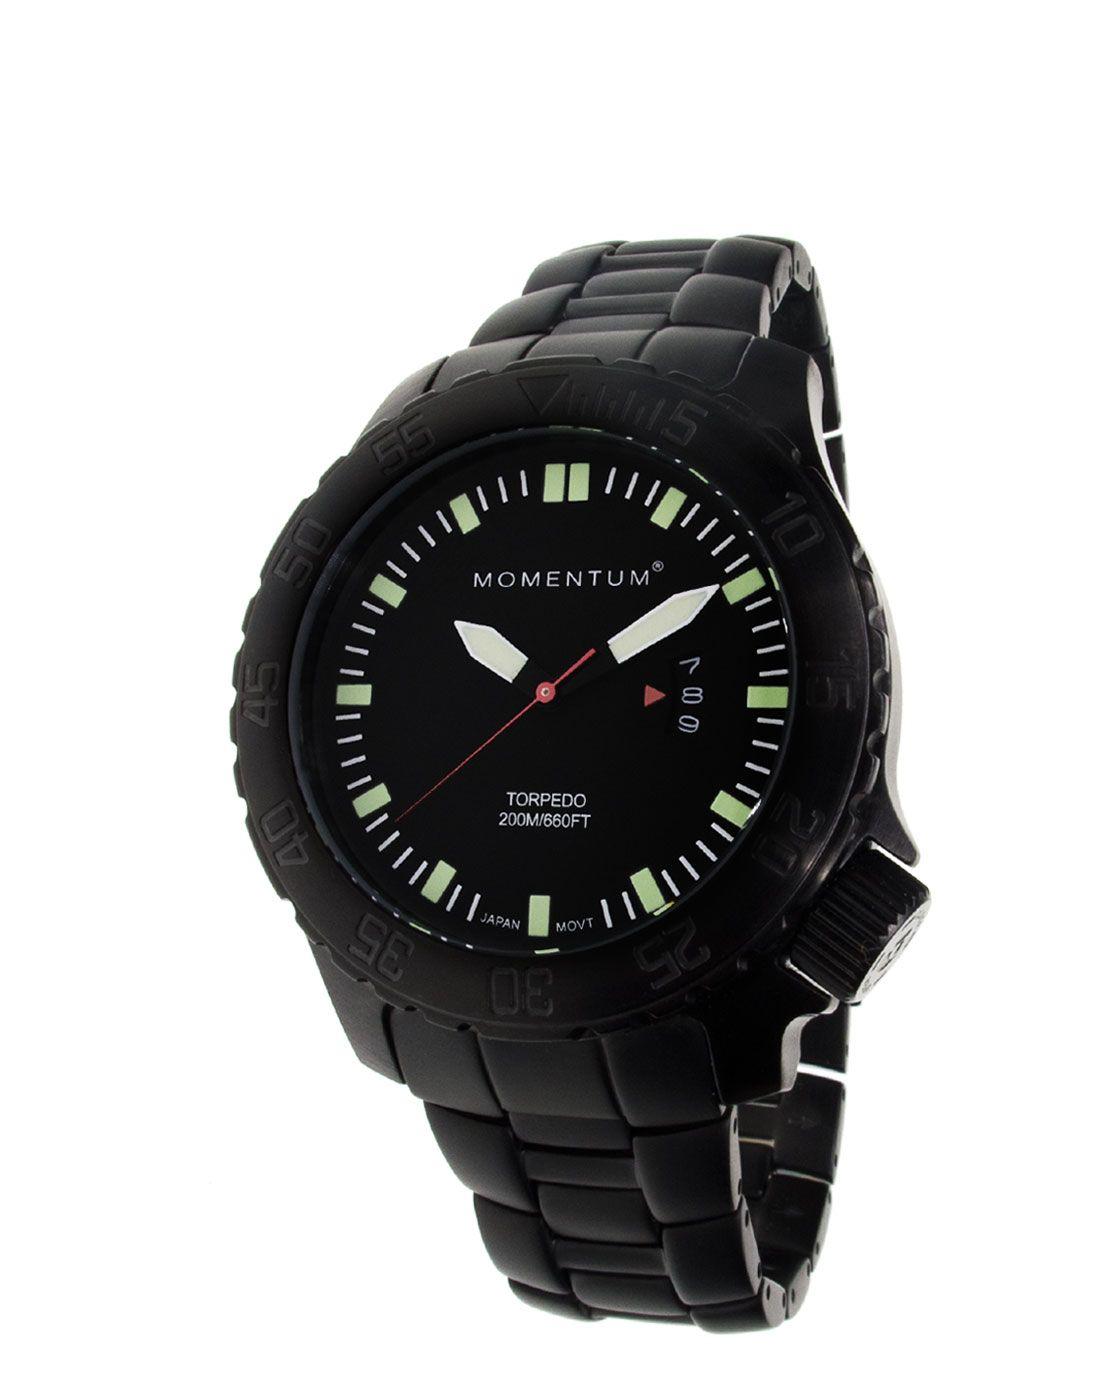 Torpedo Black-ion Steel  Watches Momentum